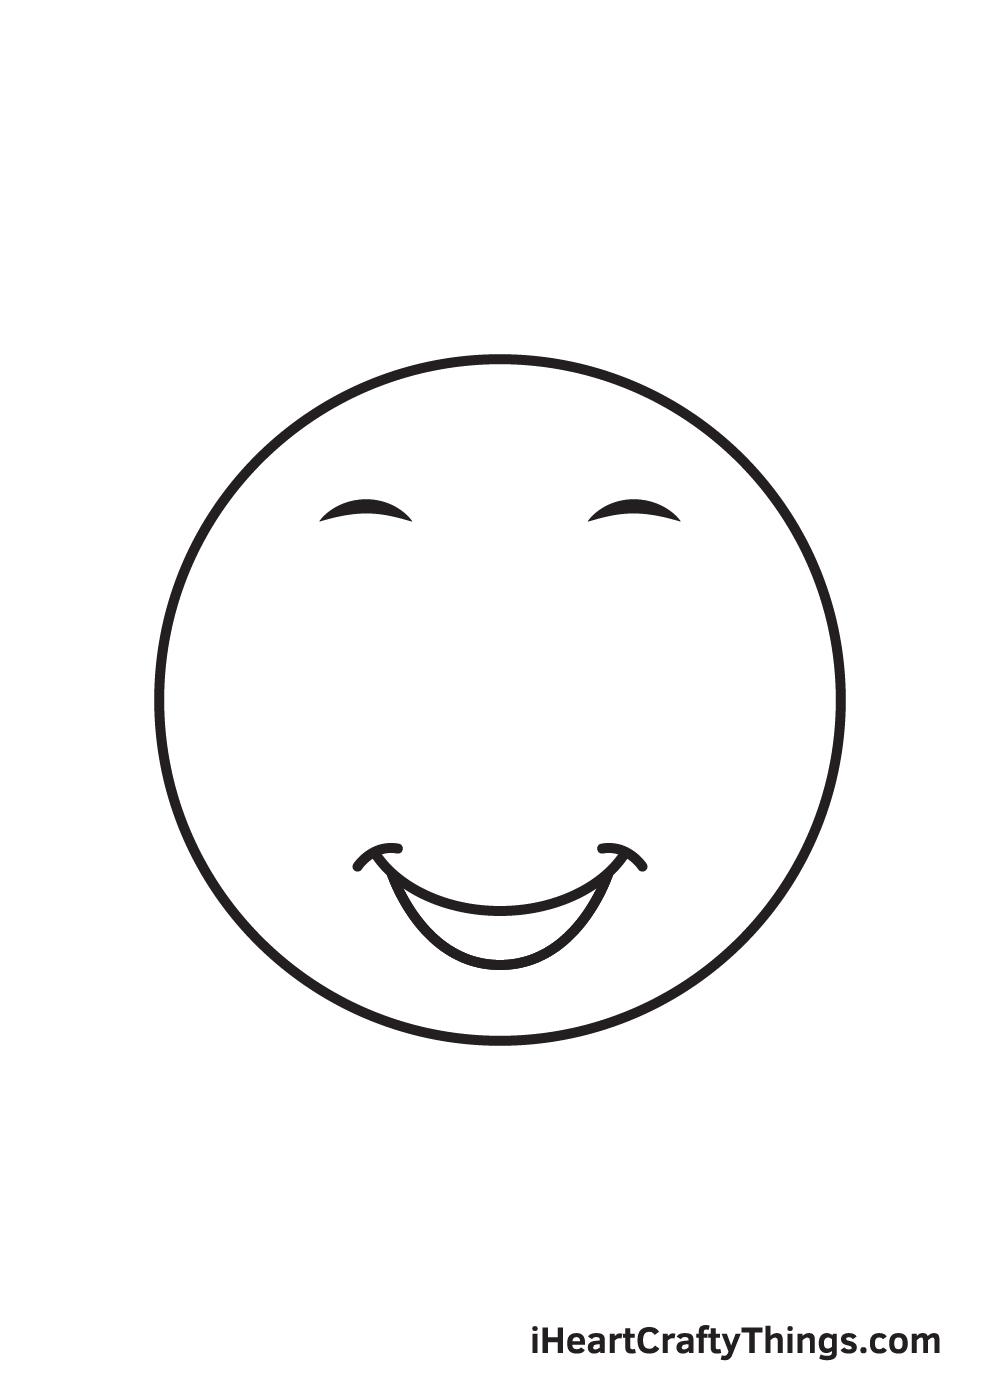 Emojis Drawing – Step 5